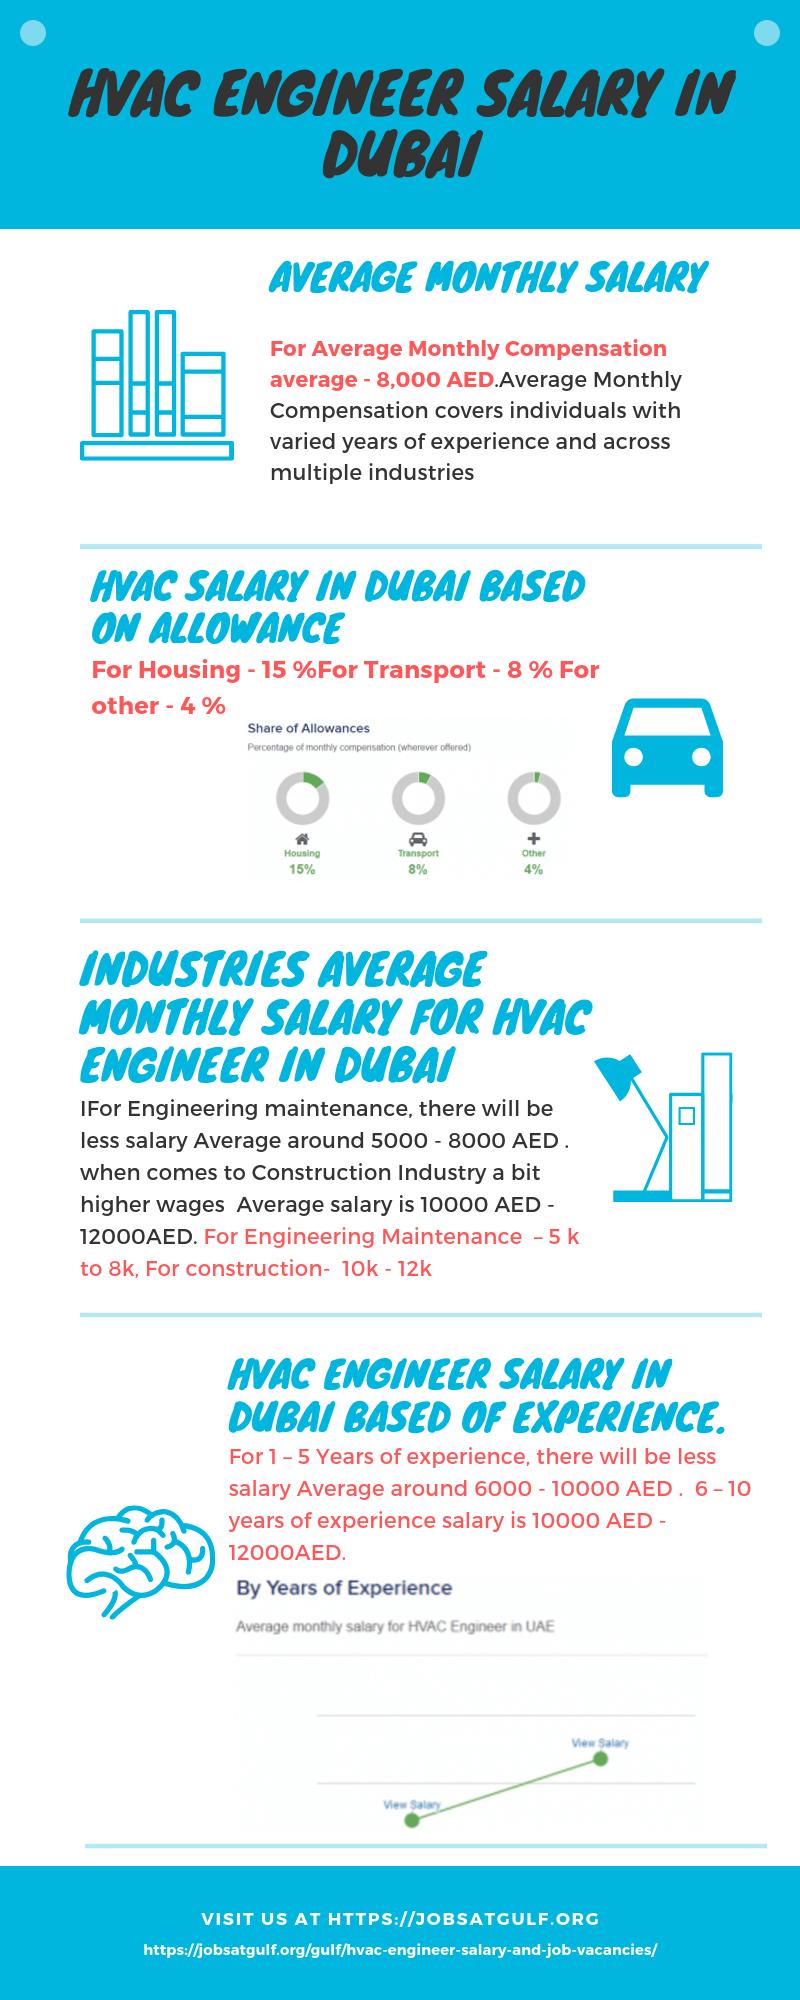 HVAC Engineer Salary in Dubai